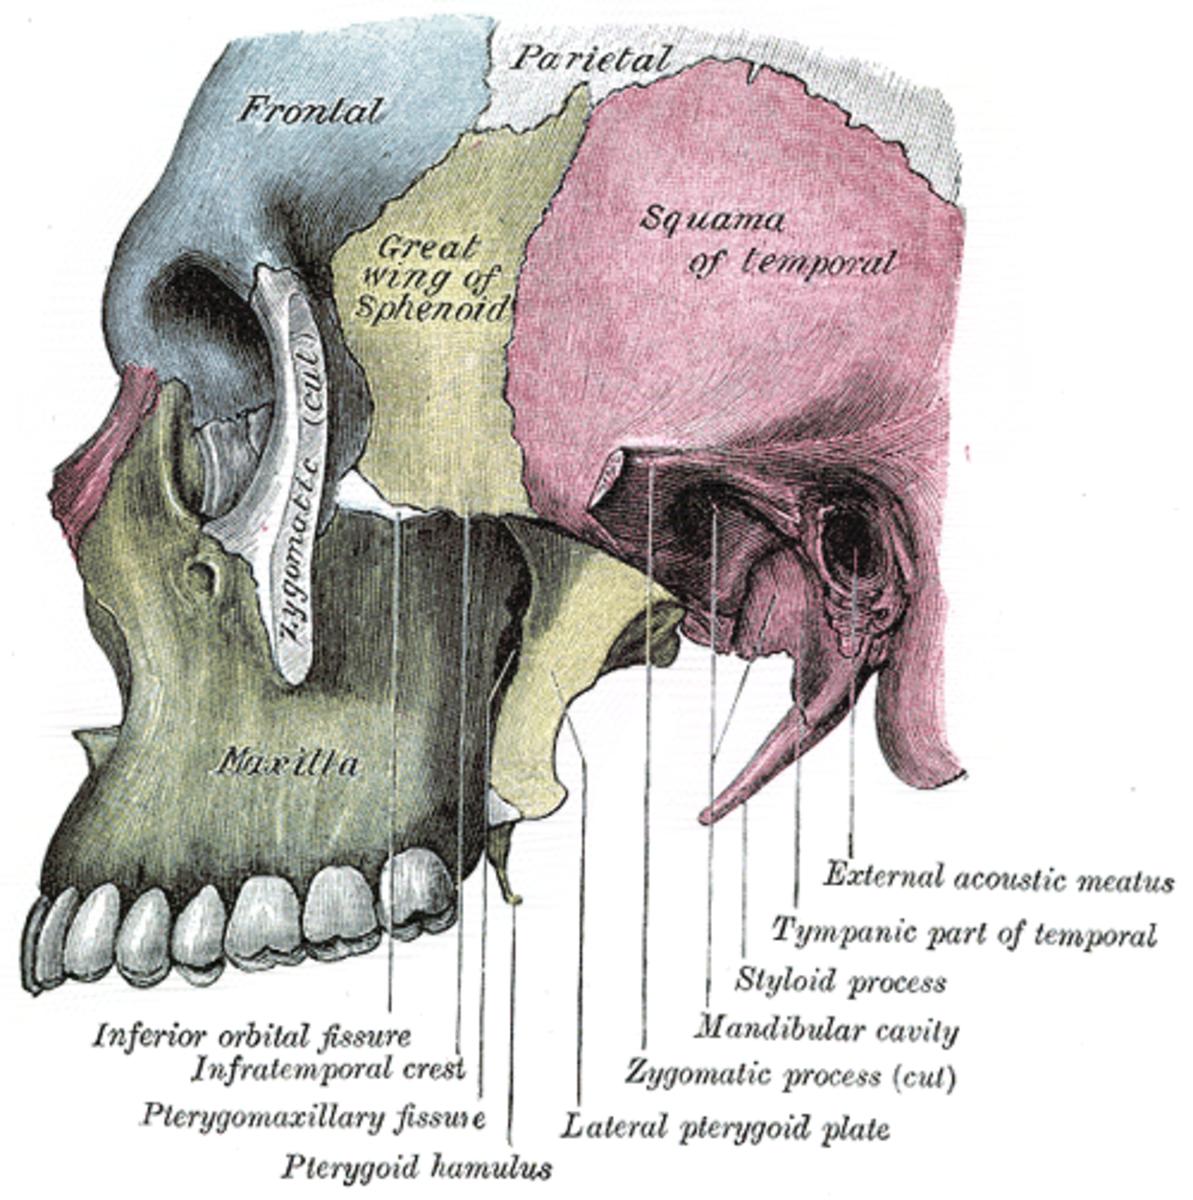 Maxilla (in green) in the human skull.